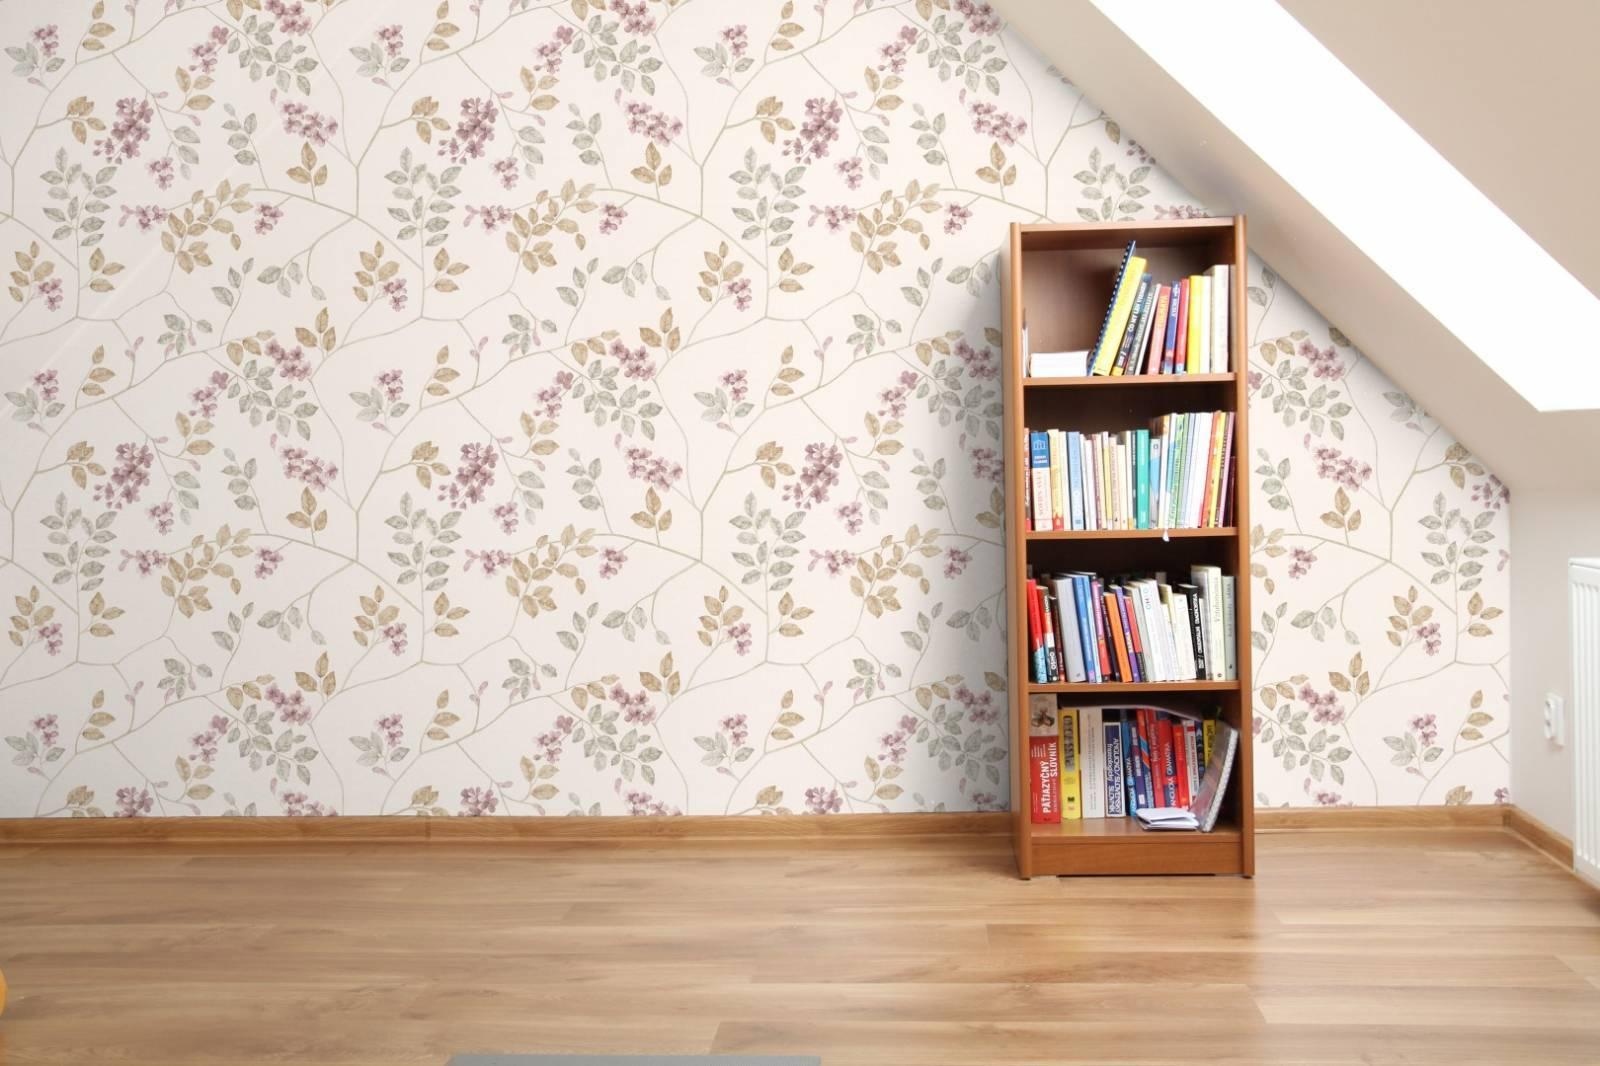 Papel de Parede Adesivo Floral /Rolo imagem 3